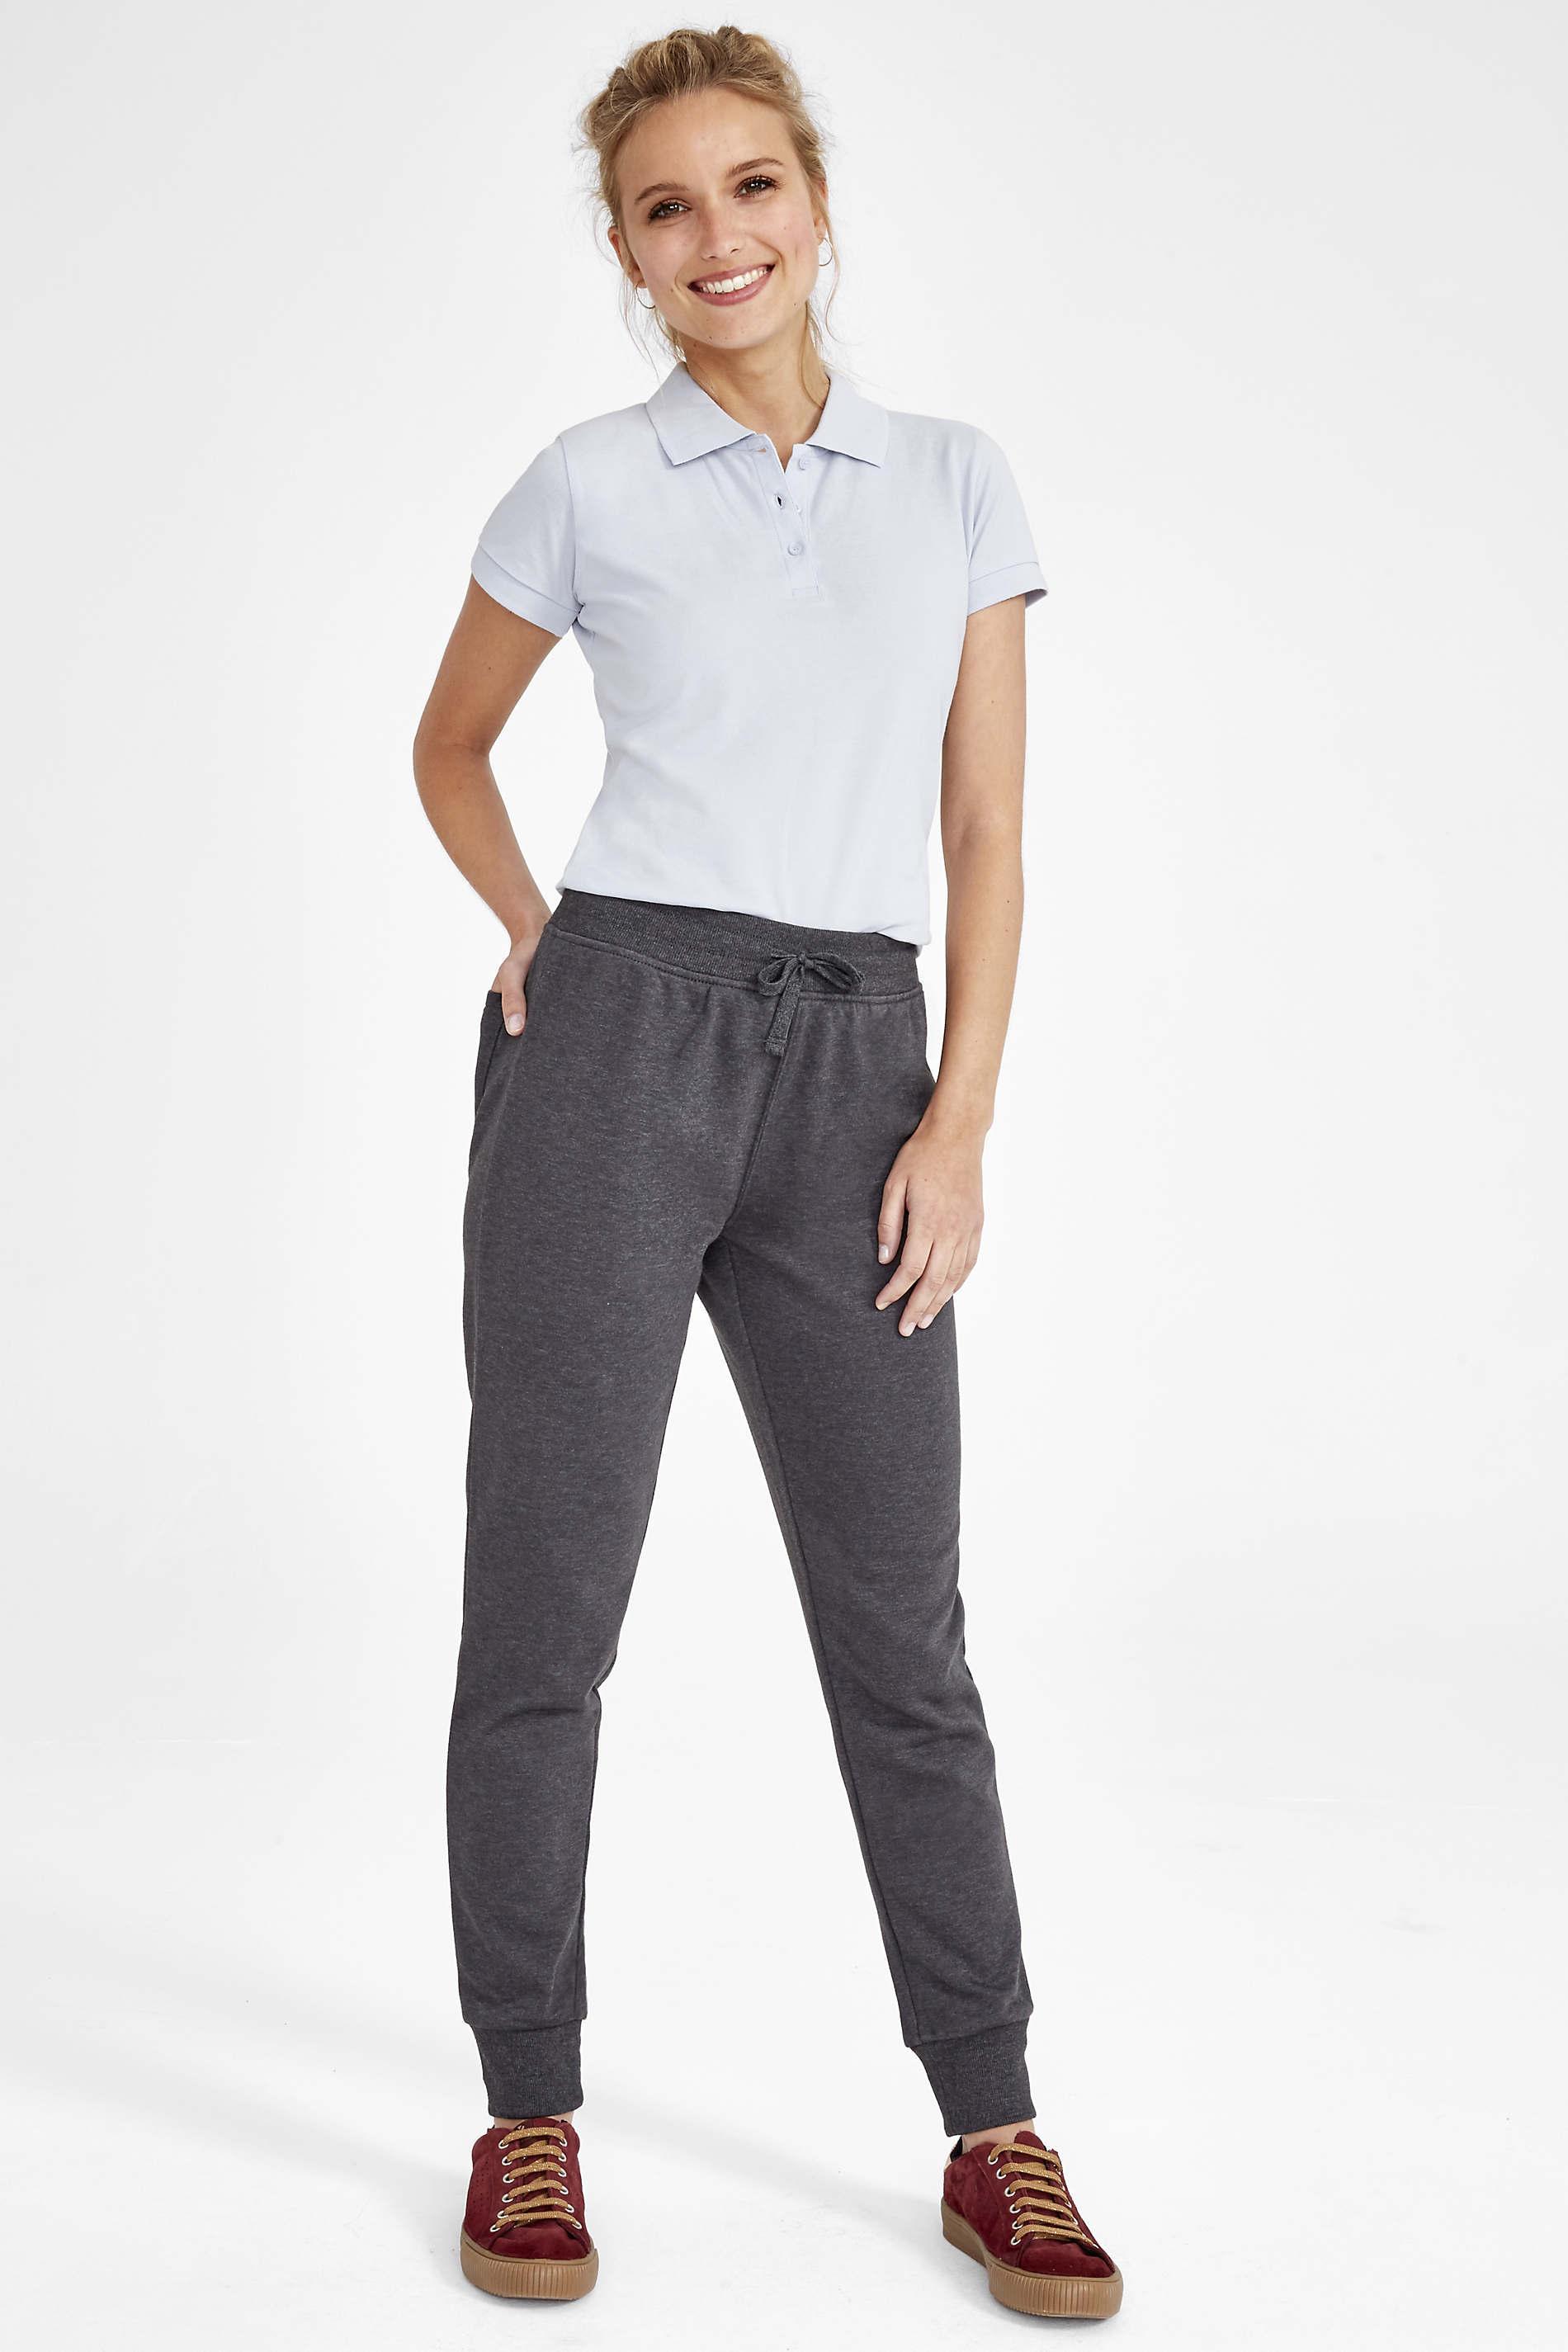 Pantalon Jogging femme coupe slim